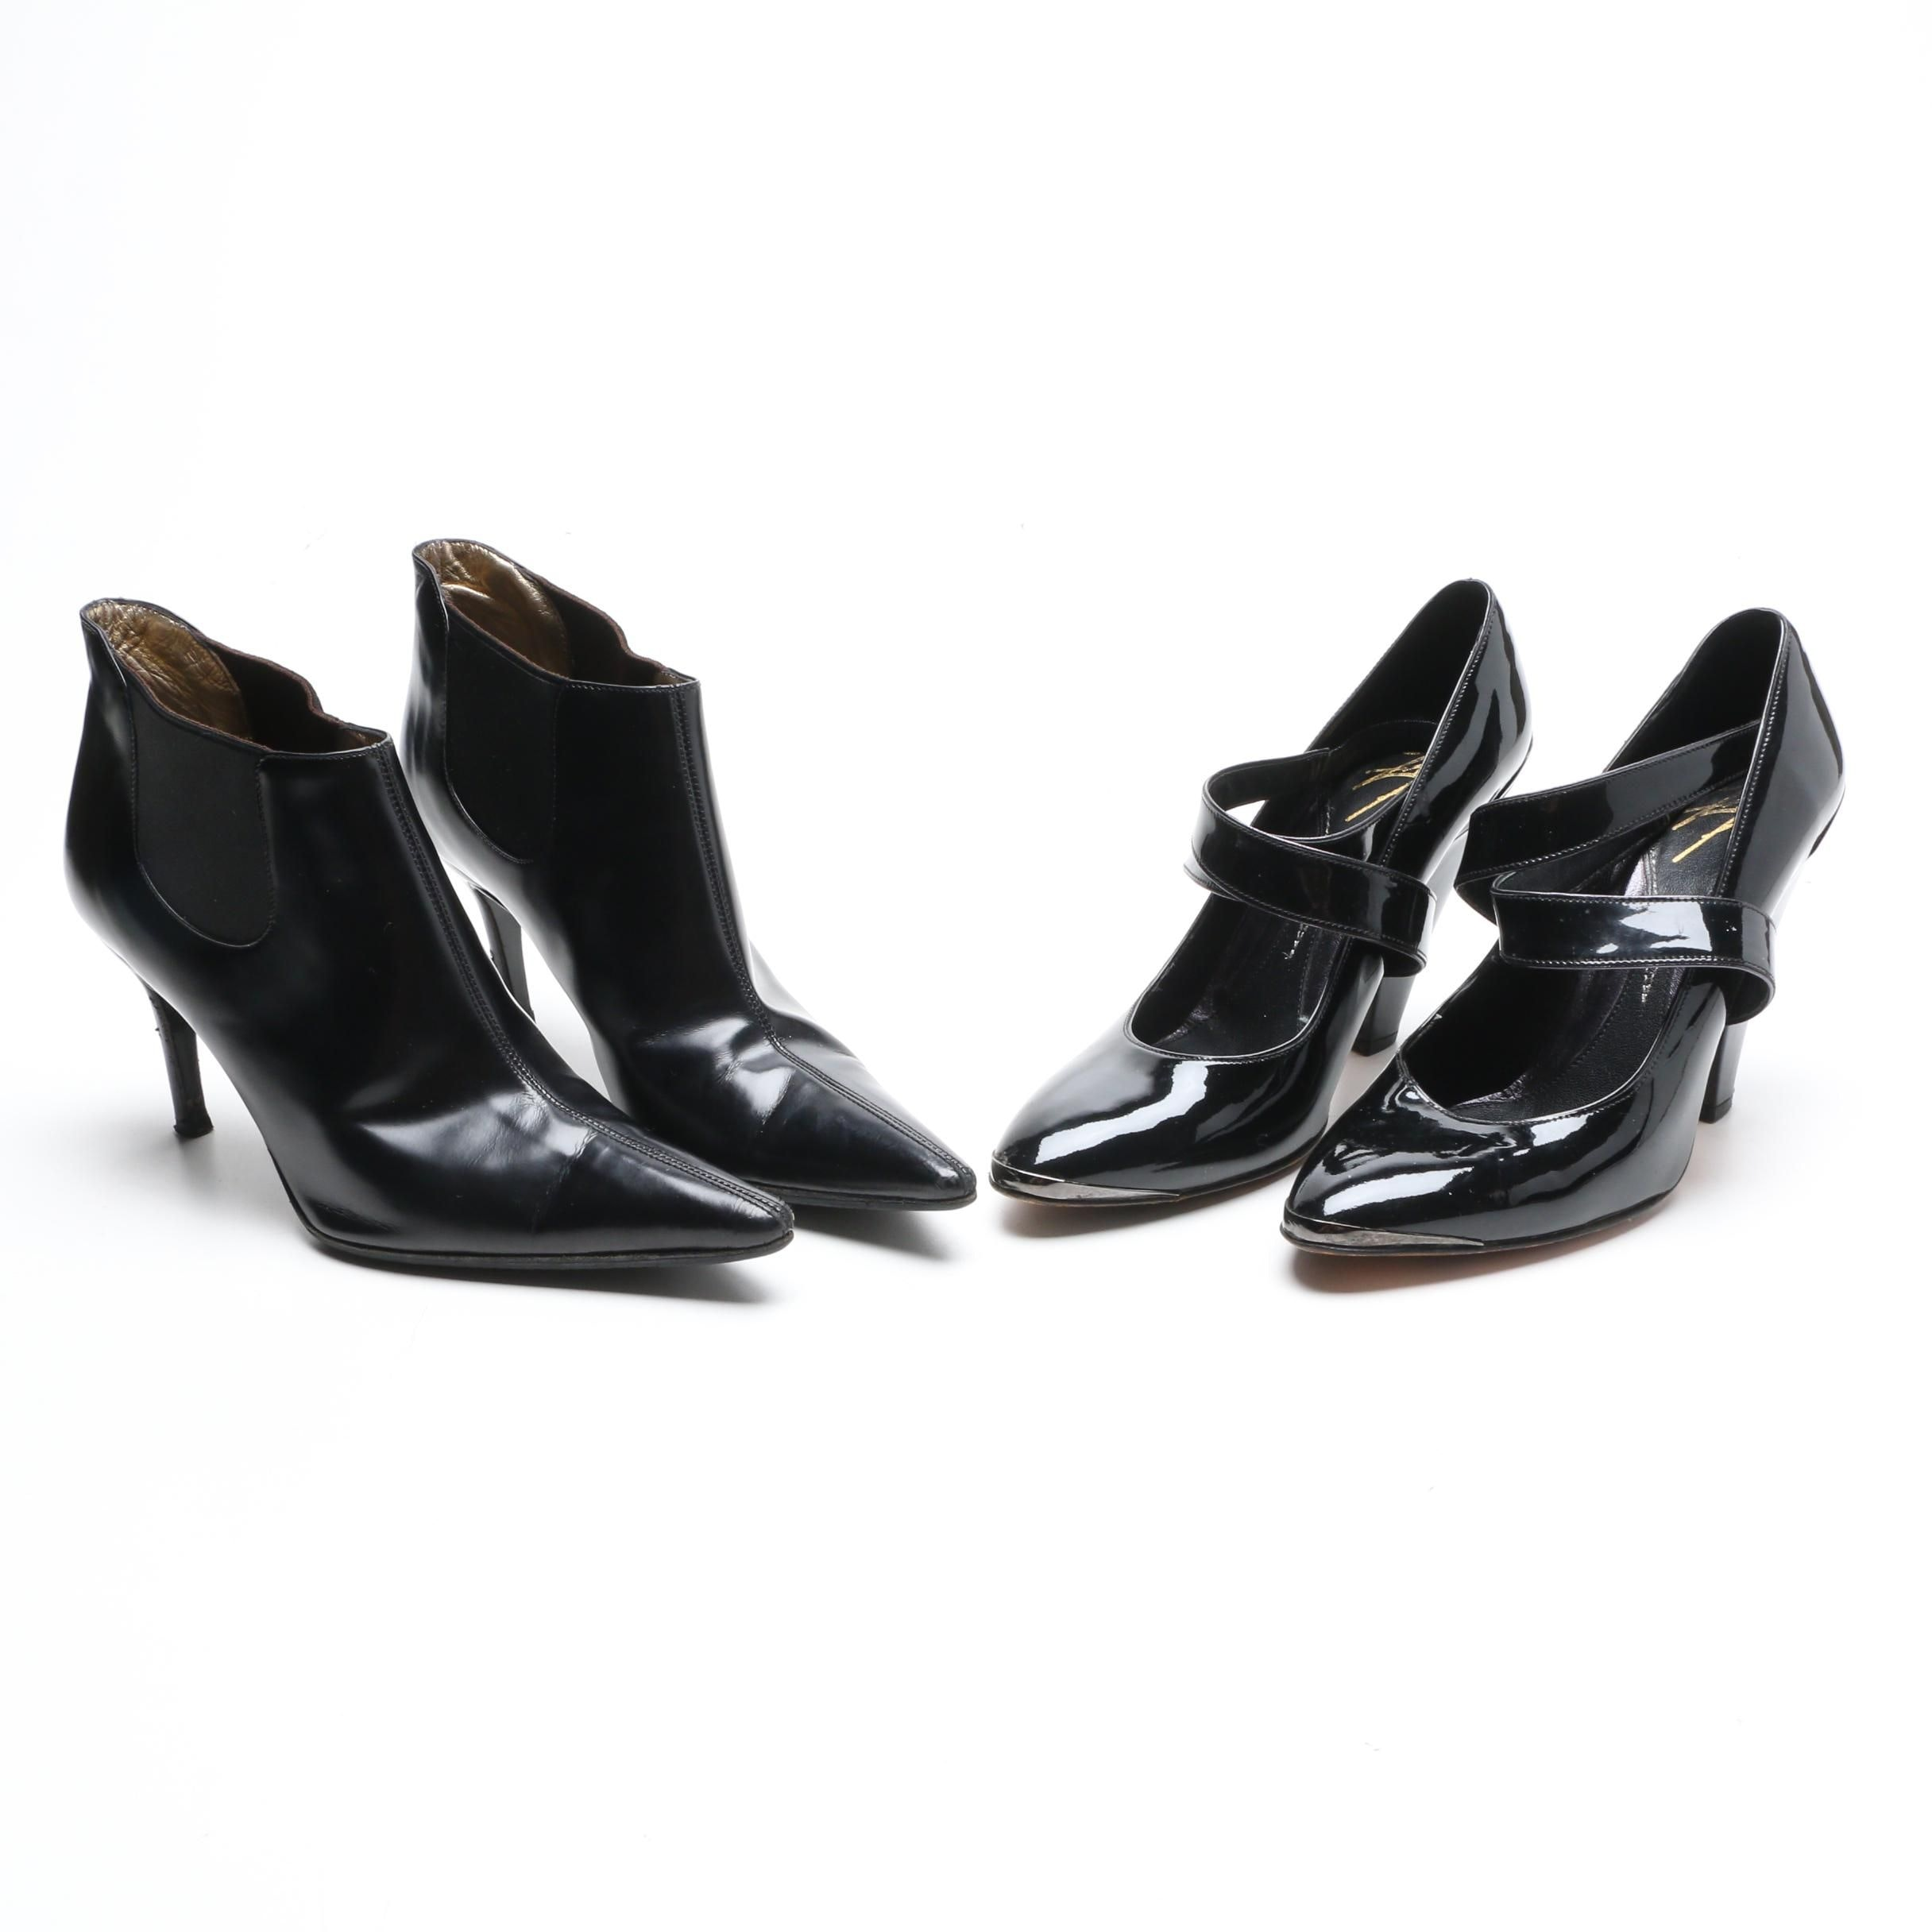 Dolce & Gabbana and Zac Posen Black Leather Heels